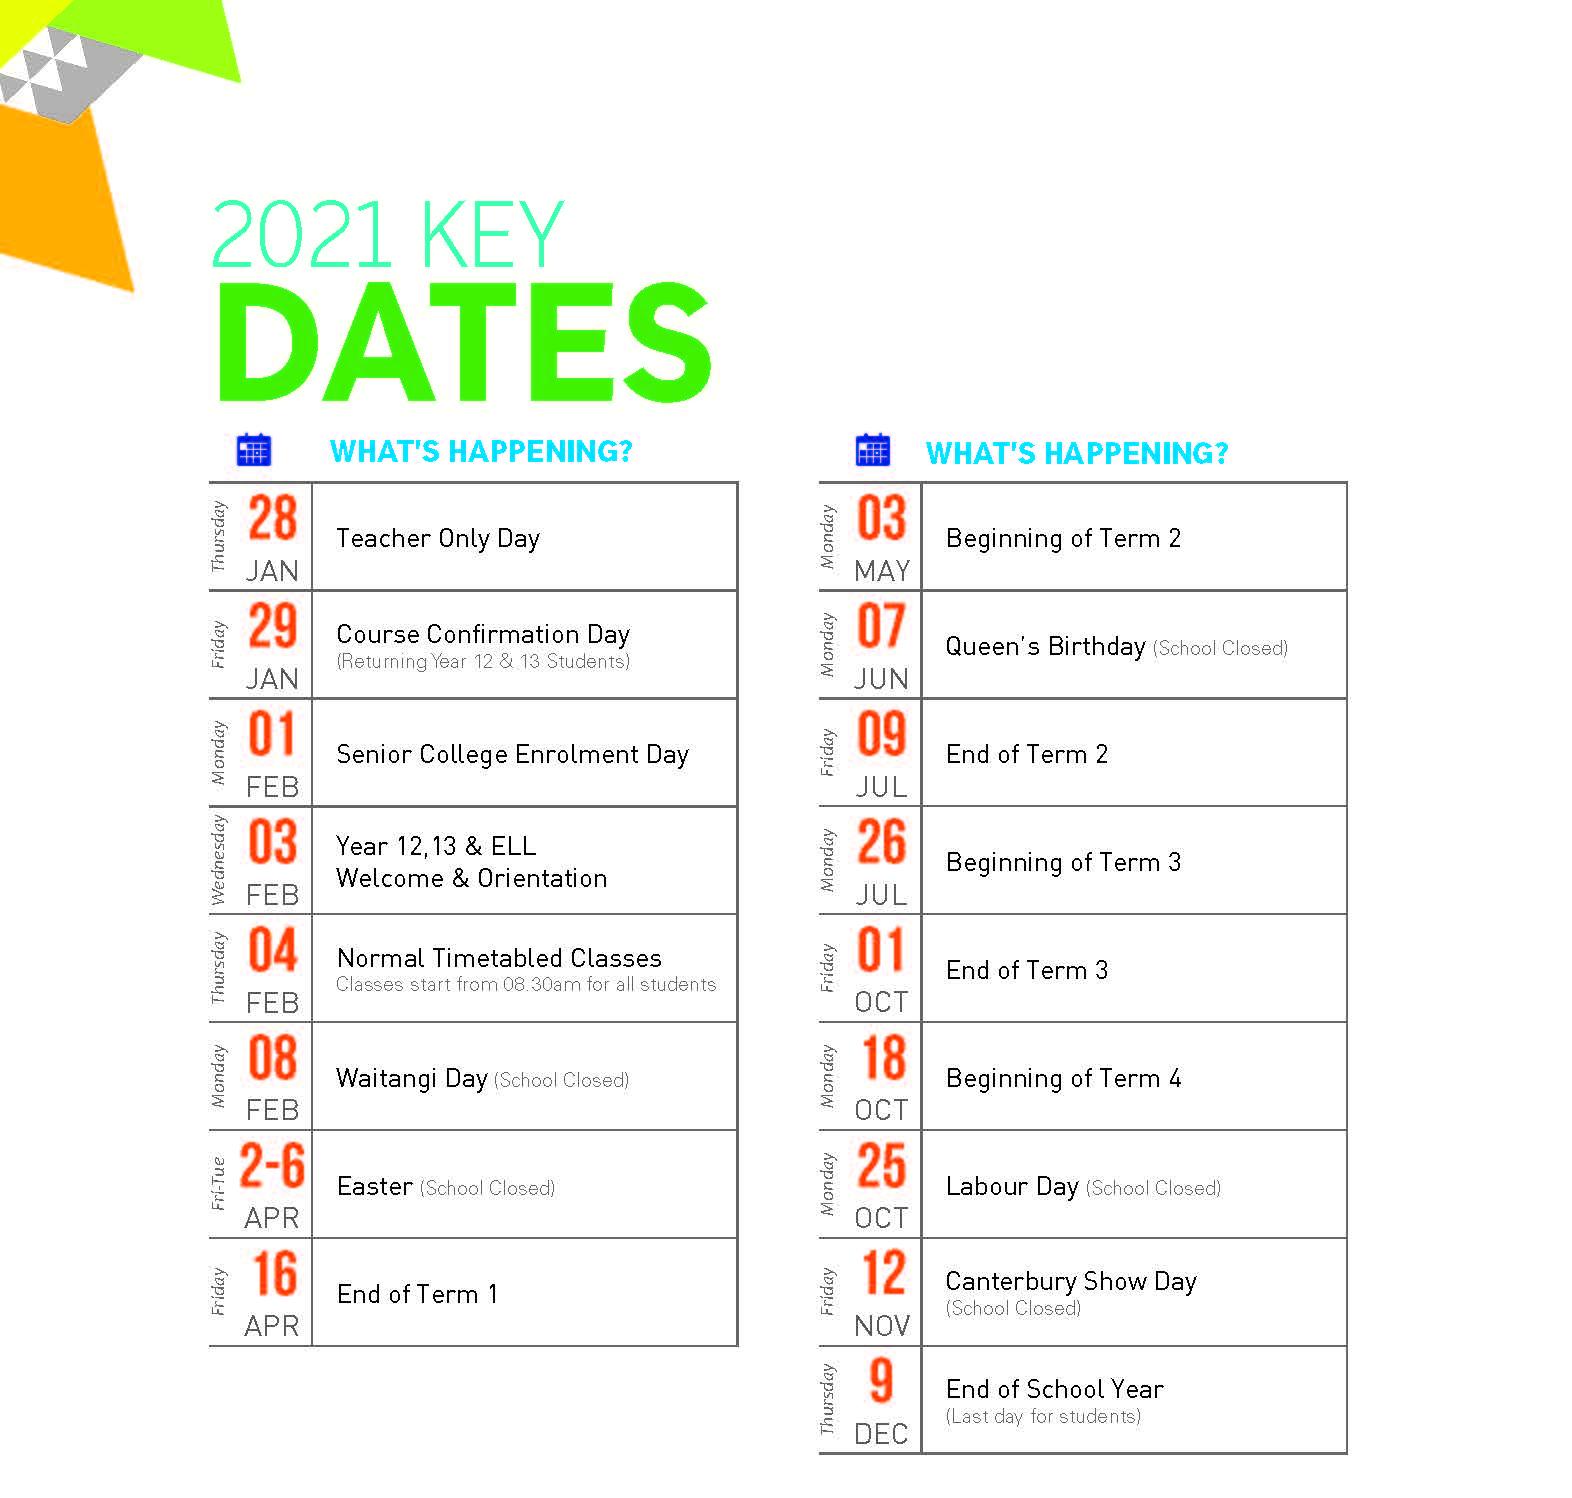 Key Dates for 2021 PDF